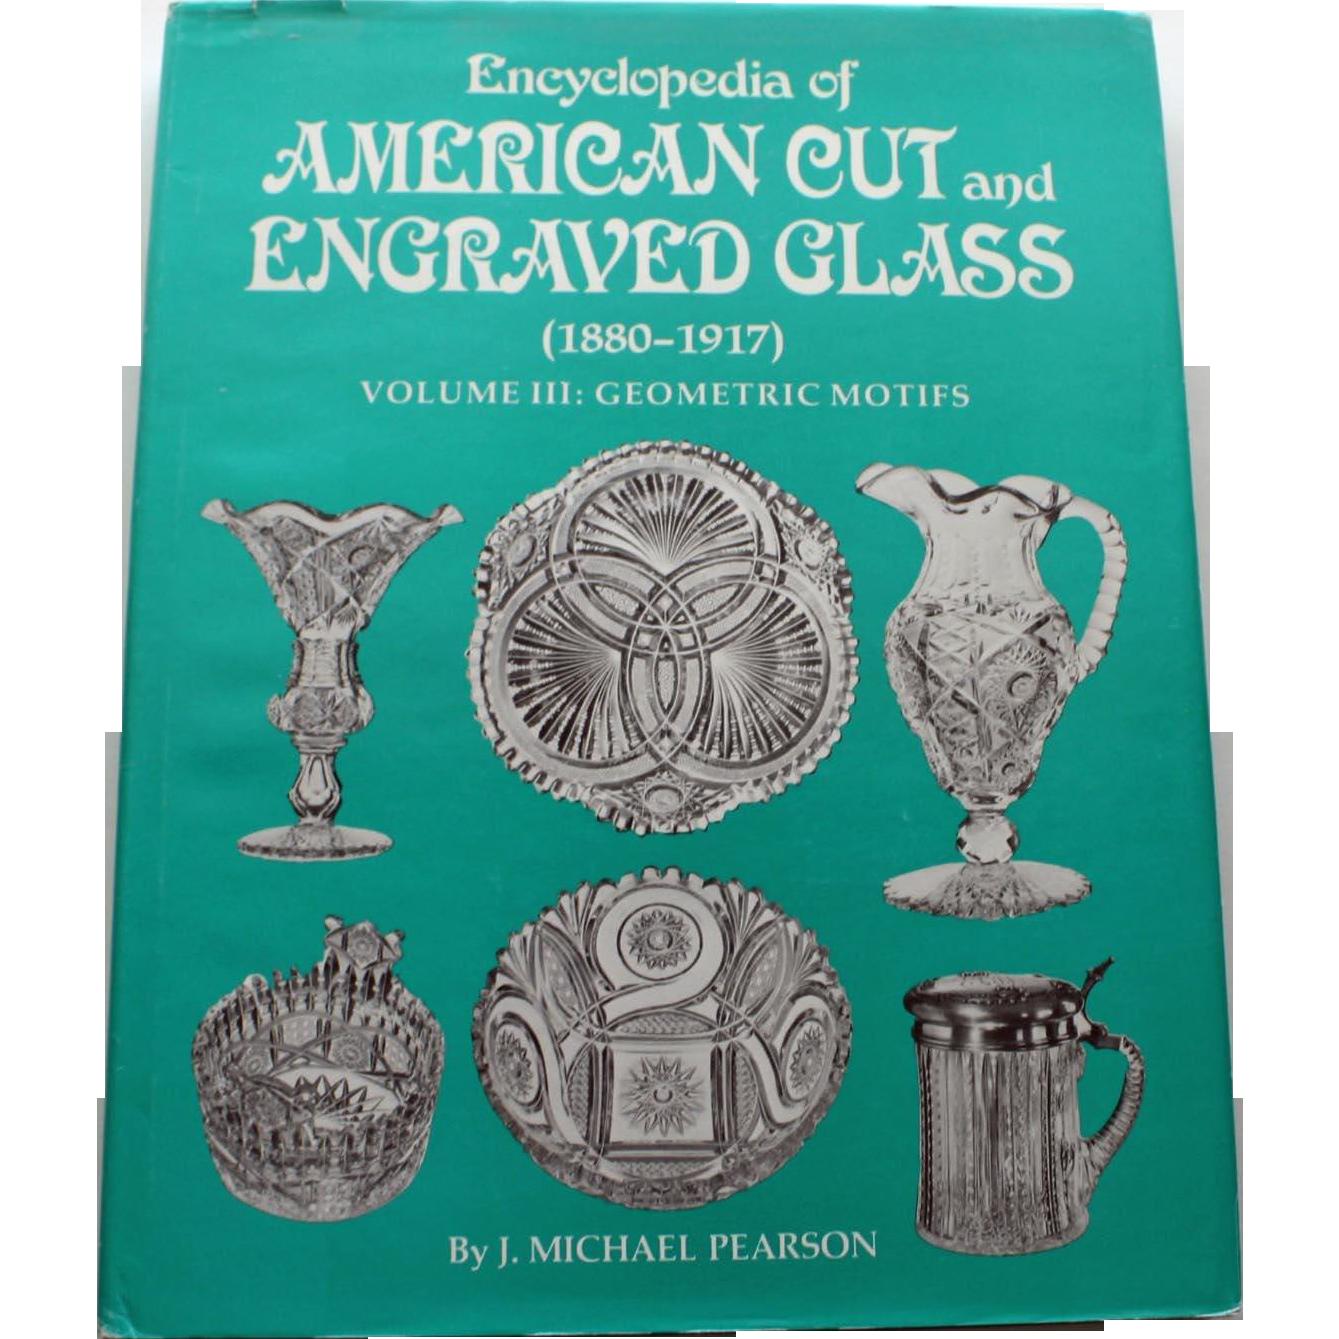 Encyclopedia of American Cut and Engraved Glass (vol. 3) by J. Michael Pearson - Geometric Motifs